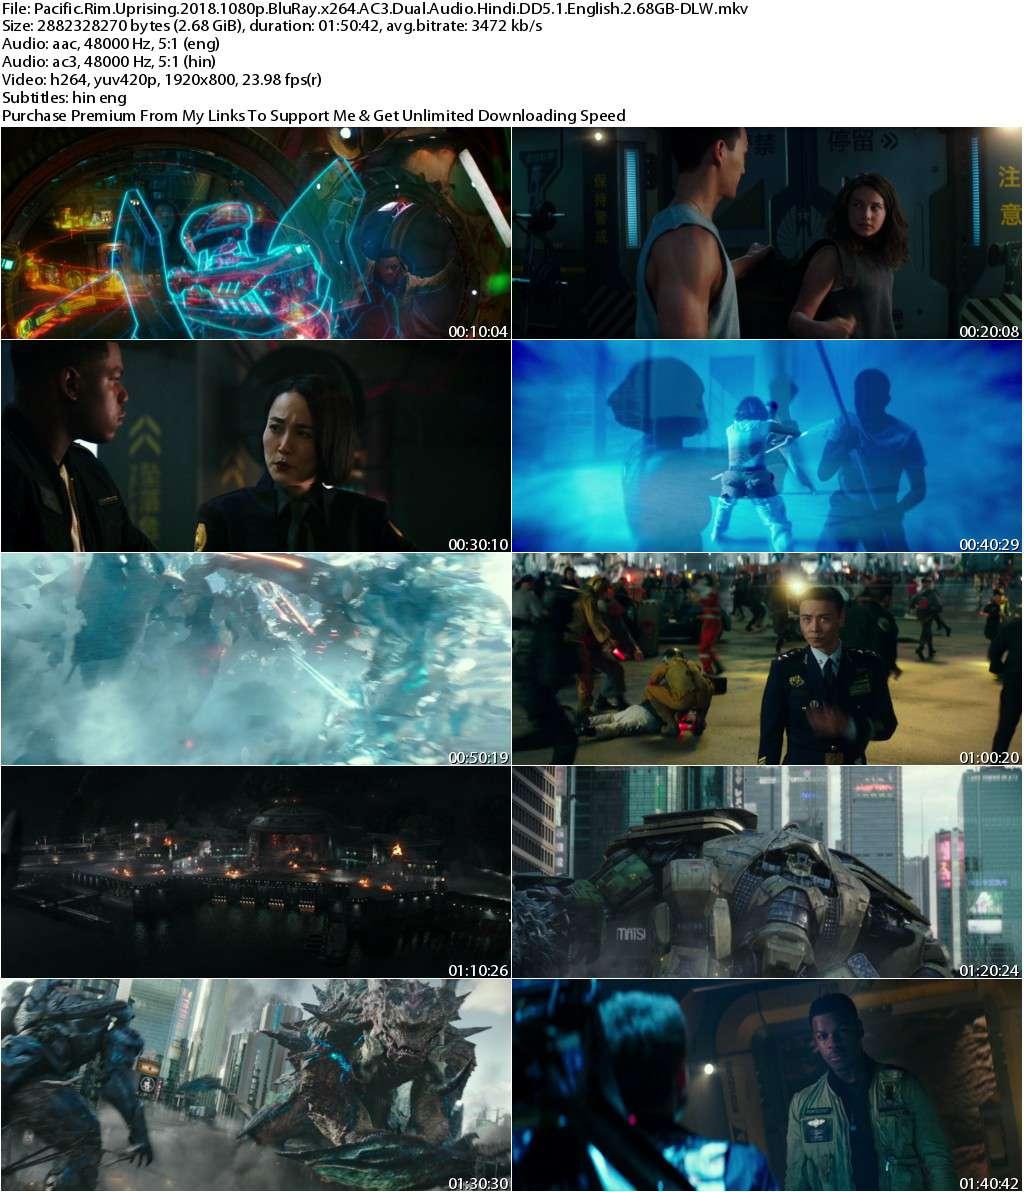 Pacific Rim Uprising (2018) 1080p BluRay x264 AC3 Dual Audio [Hindi DD5.1+English] 2.68GB-DLW